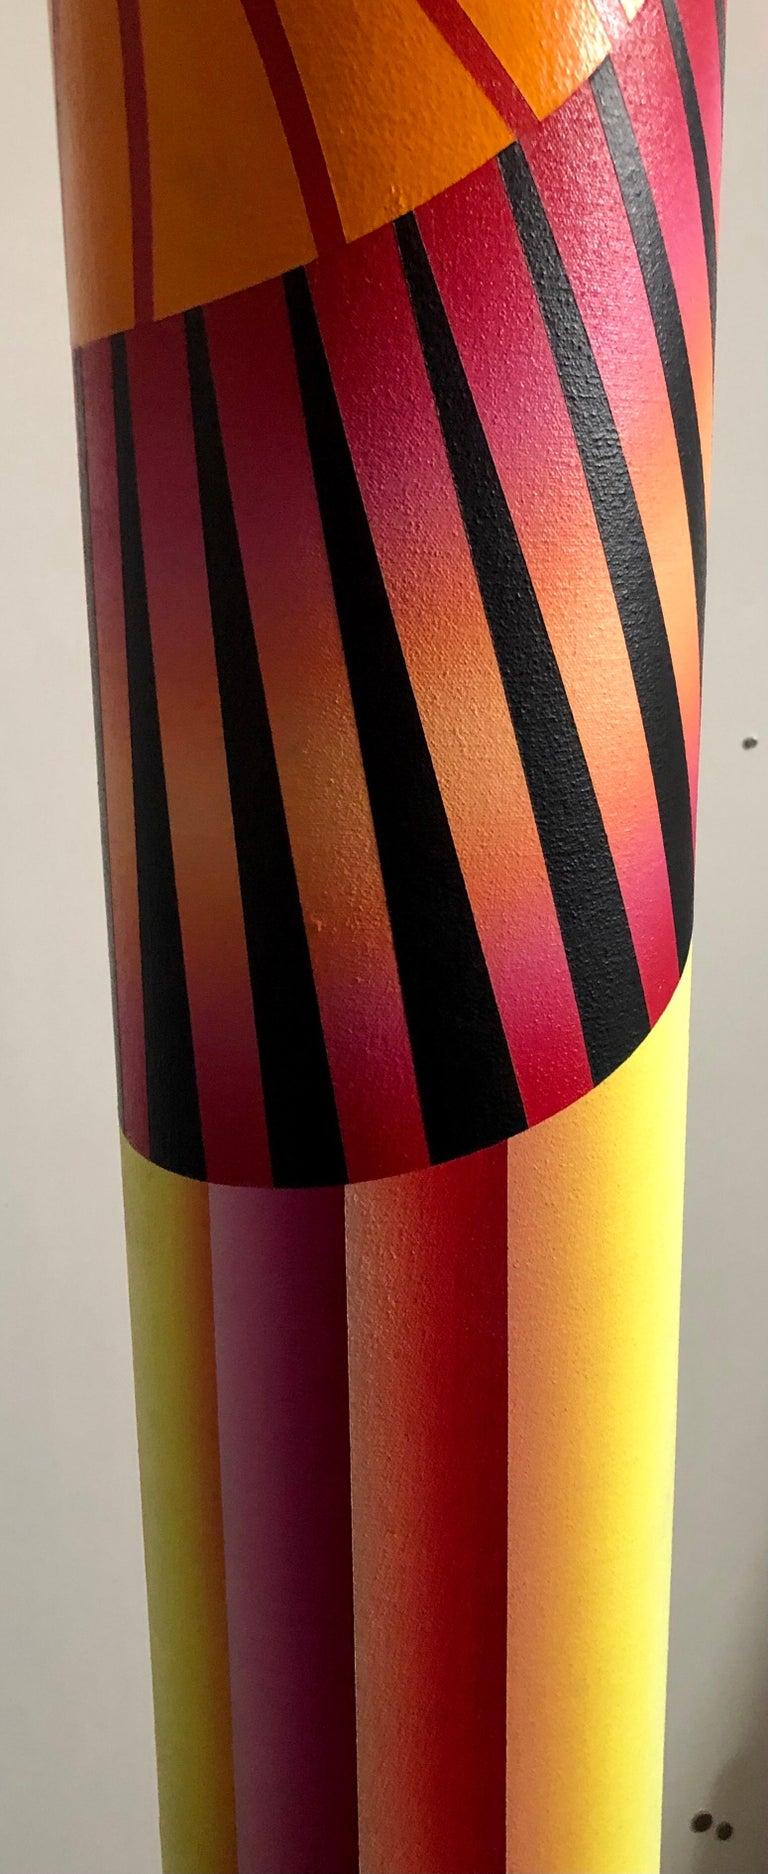 Abstract Geometric Shaped Canvas Painting Sculpture Memphis Milano Era 1980s Art 1